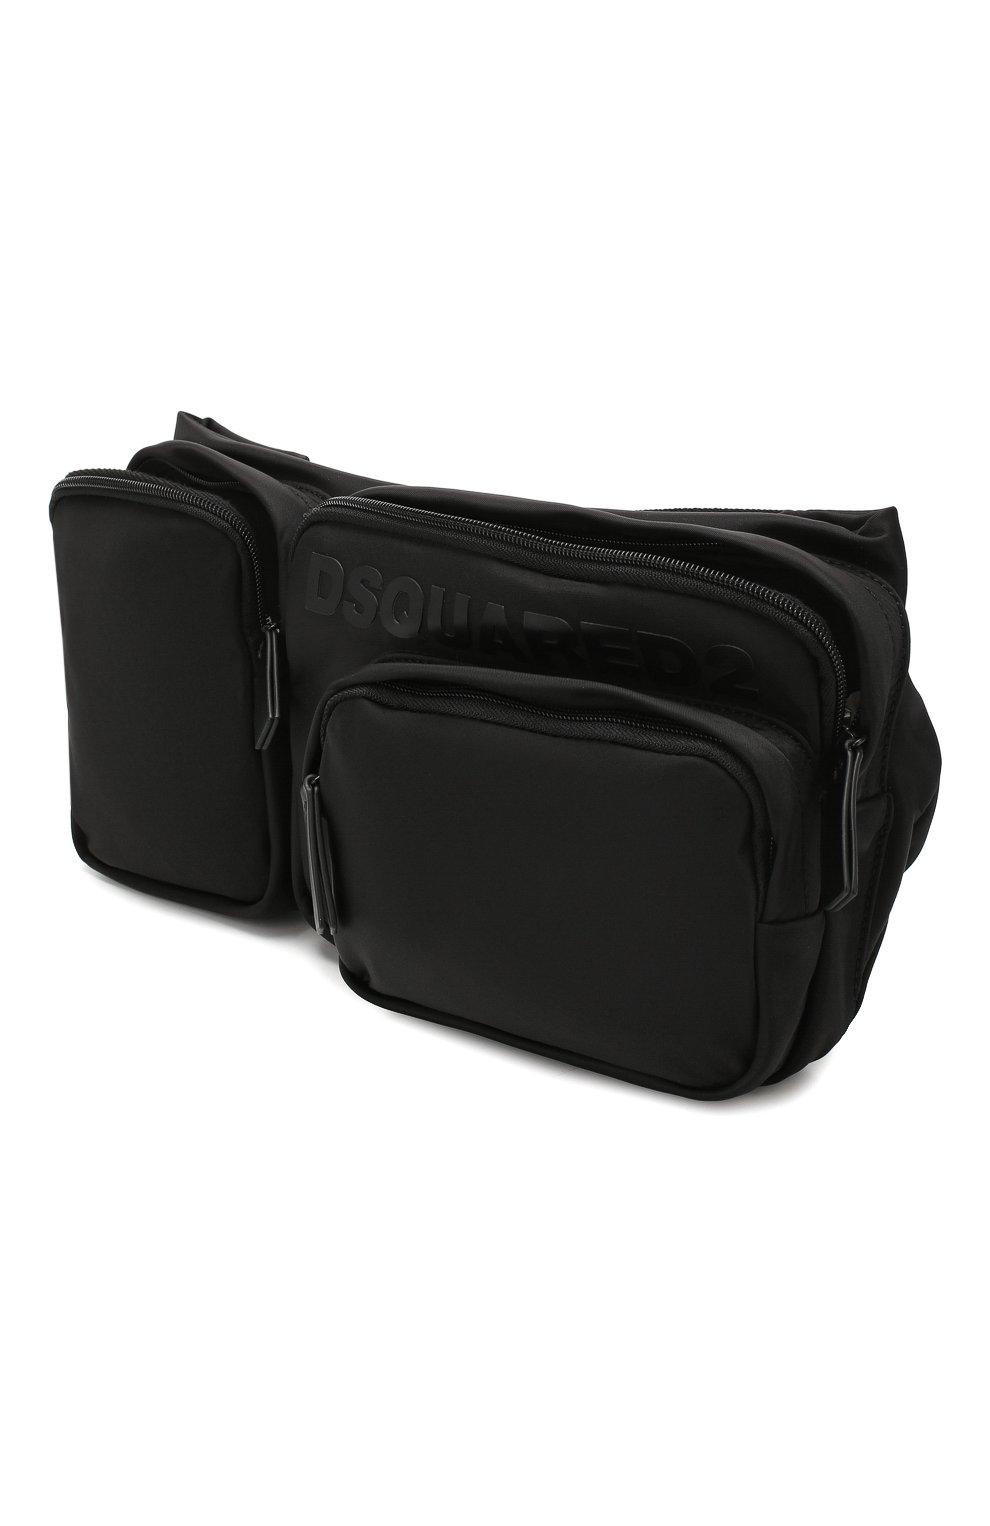 Мужская текстильная поясная сумка DSQUARED2 черного цвета, арт. BBM0020 11702174   Фото 4